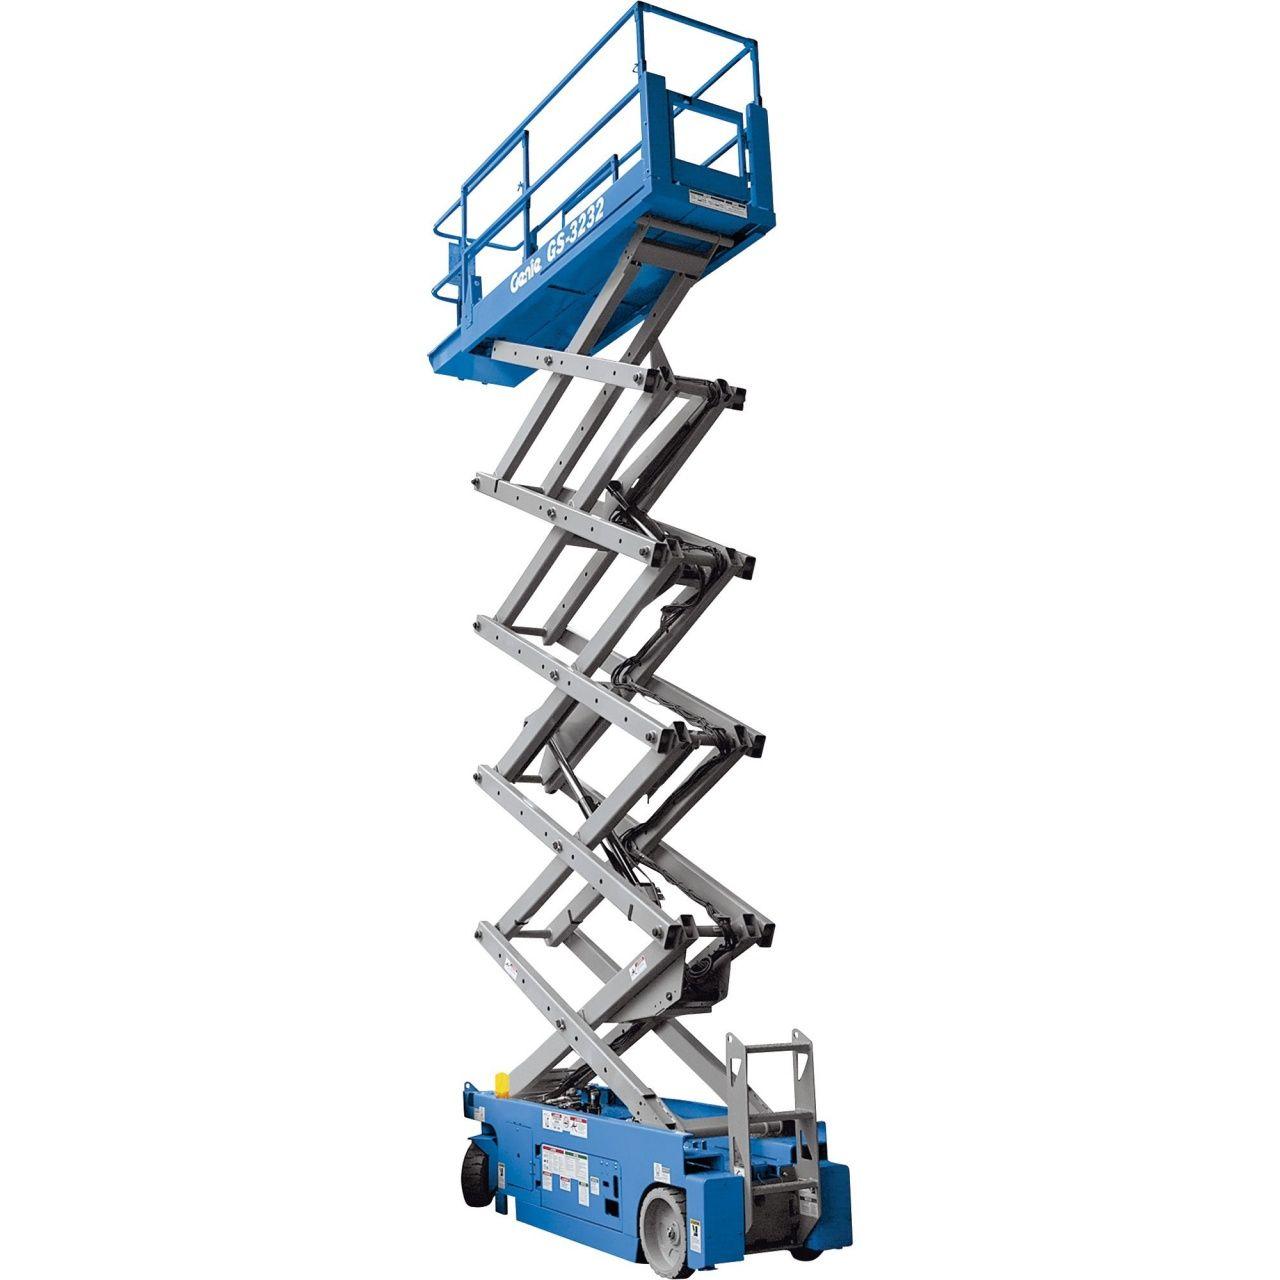 Roughneck Stair Climber Hand Truck In 2020 Stair Climbing Scissor Lift Railing Design